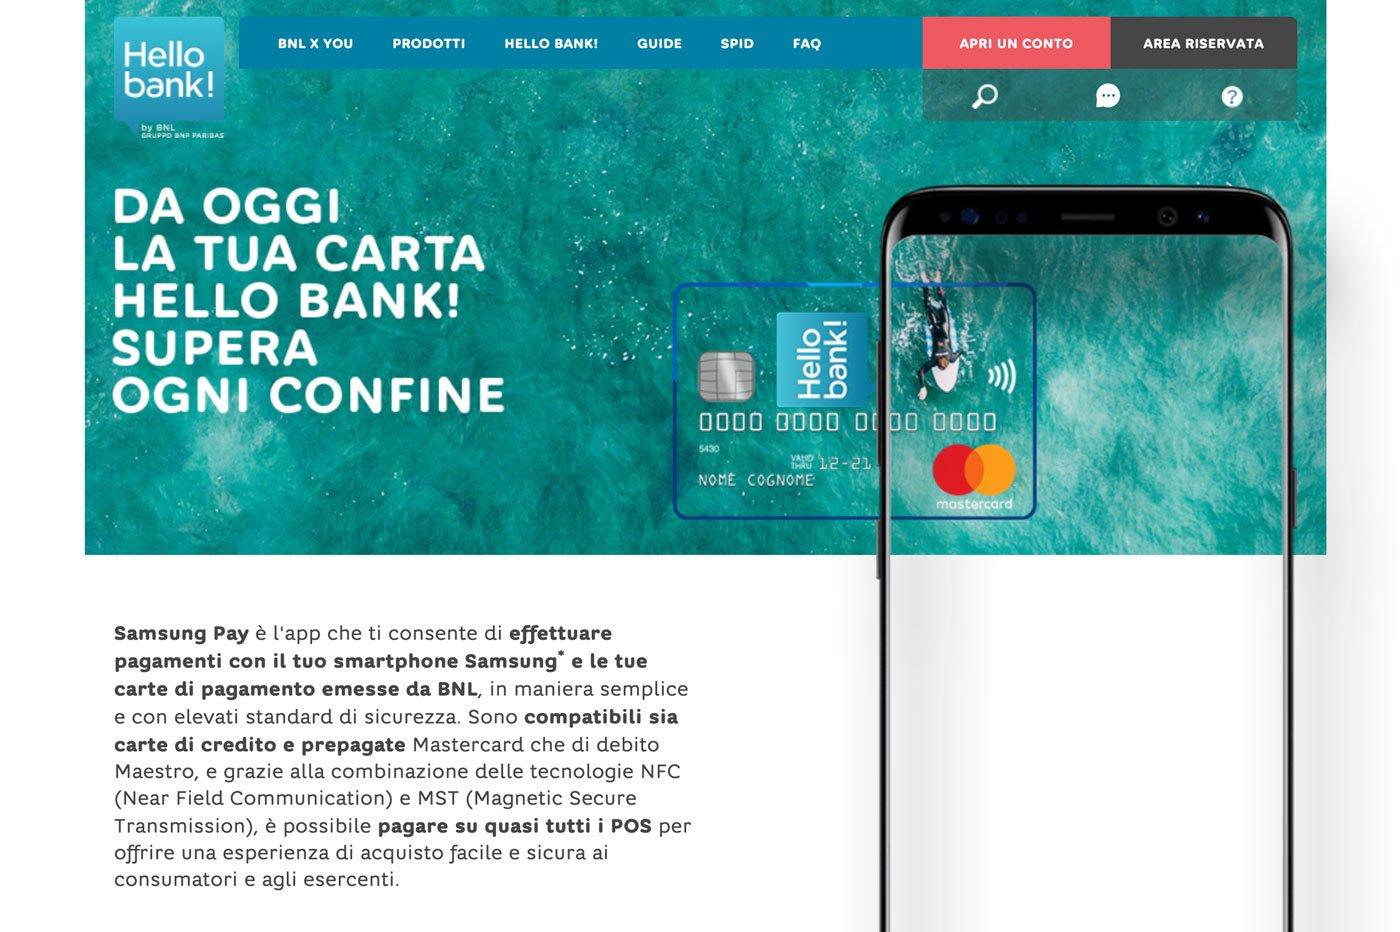 Hello bank! et Samsung Pay